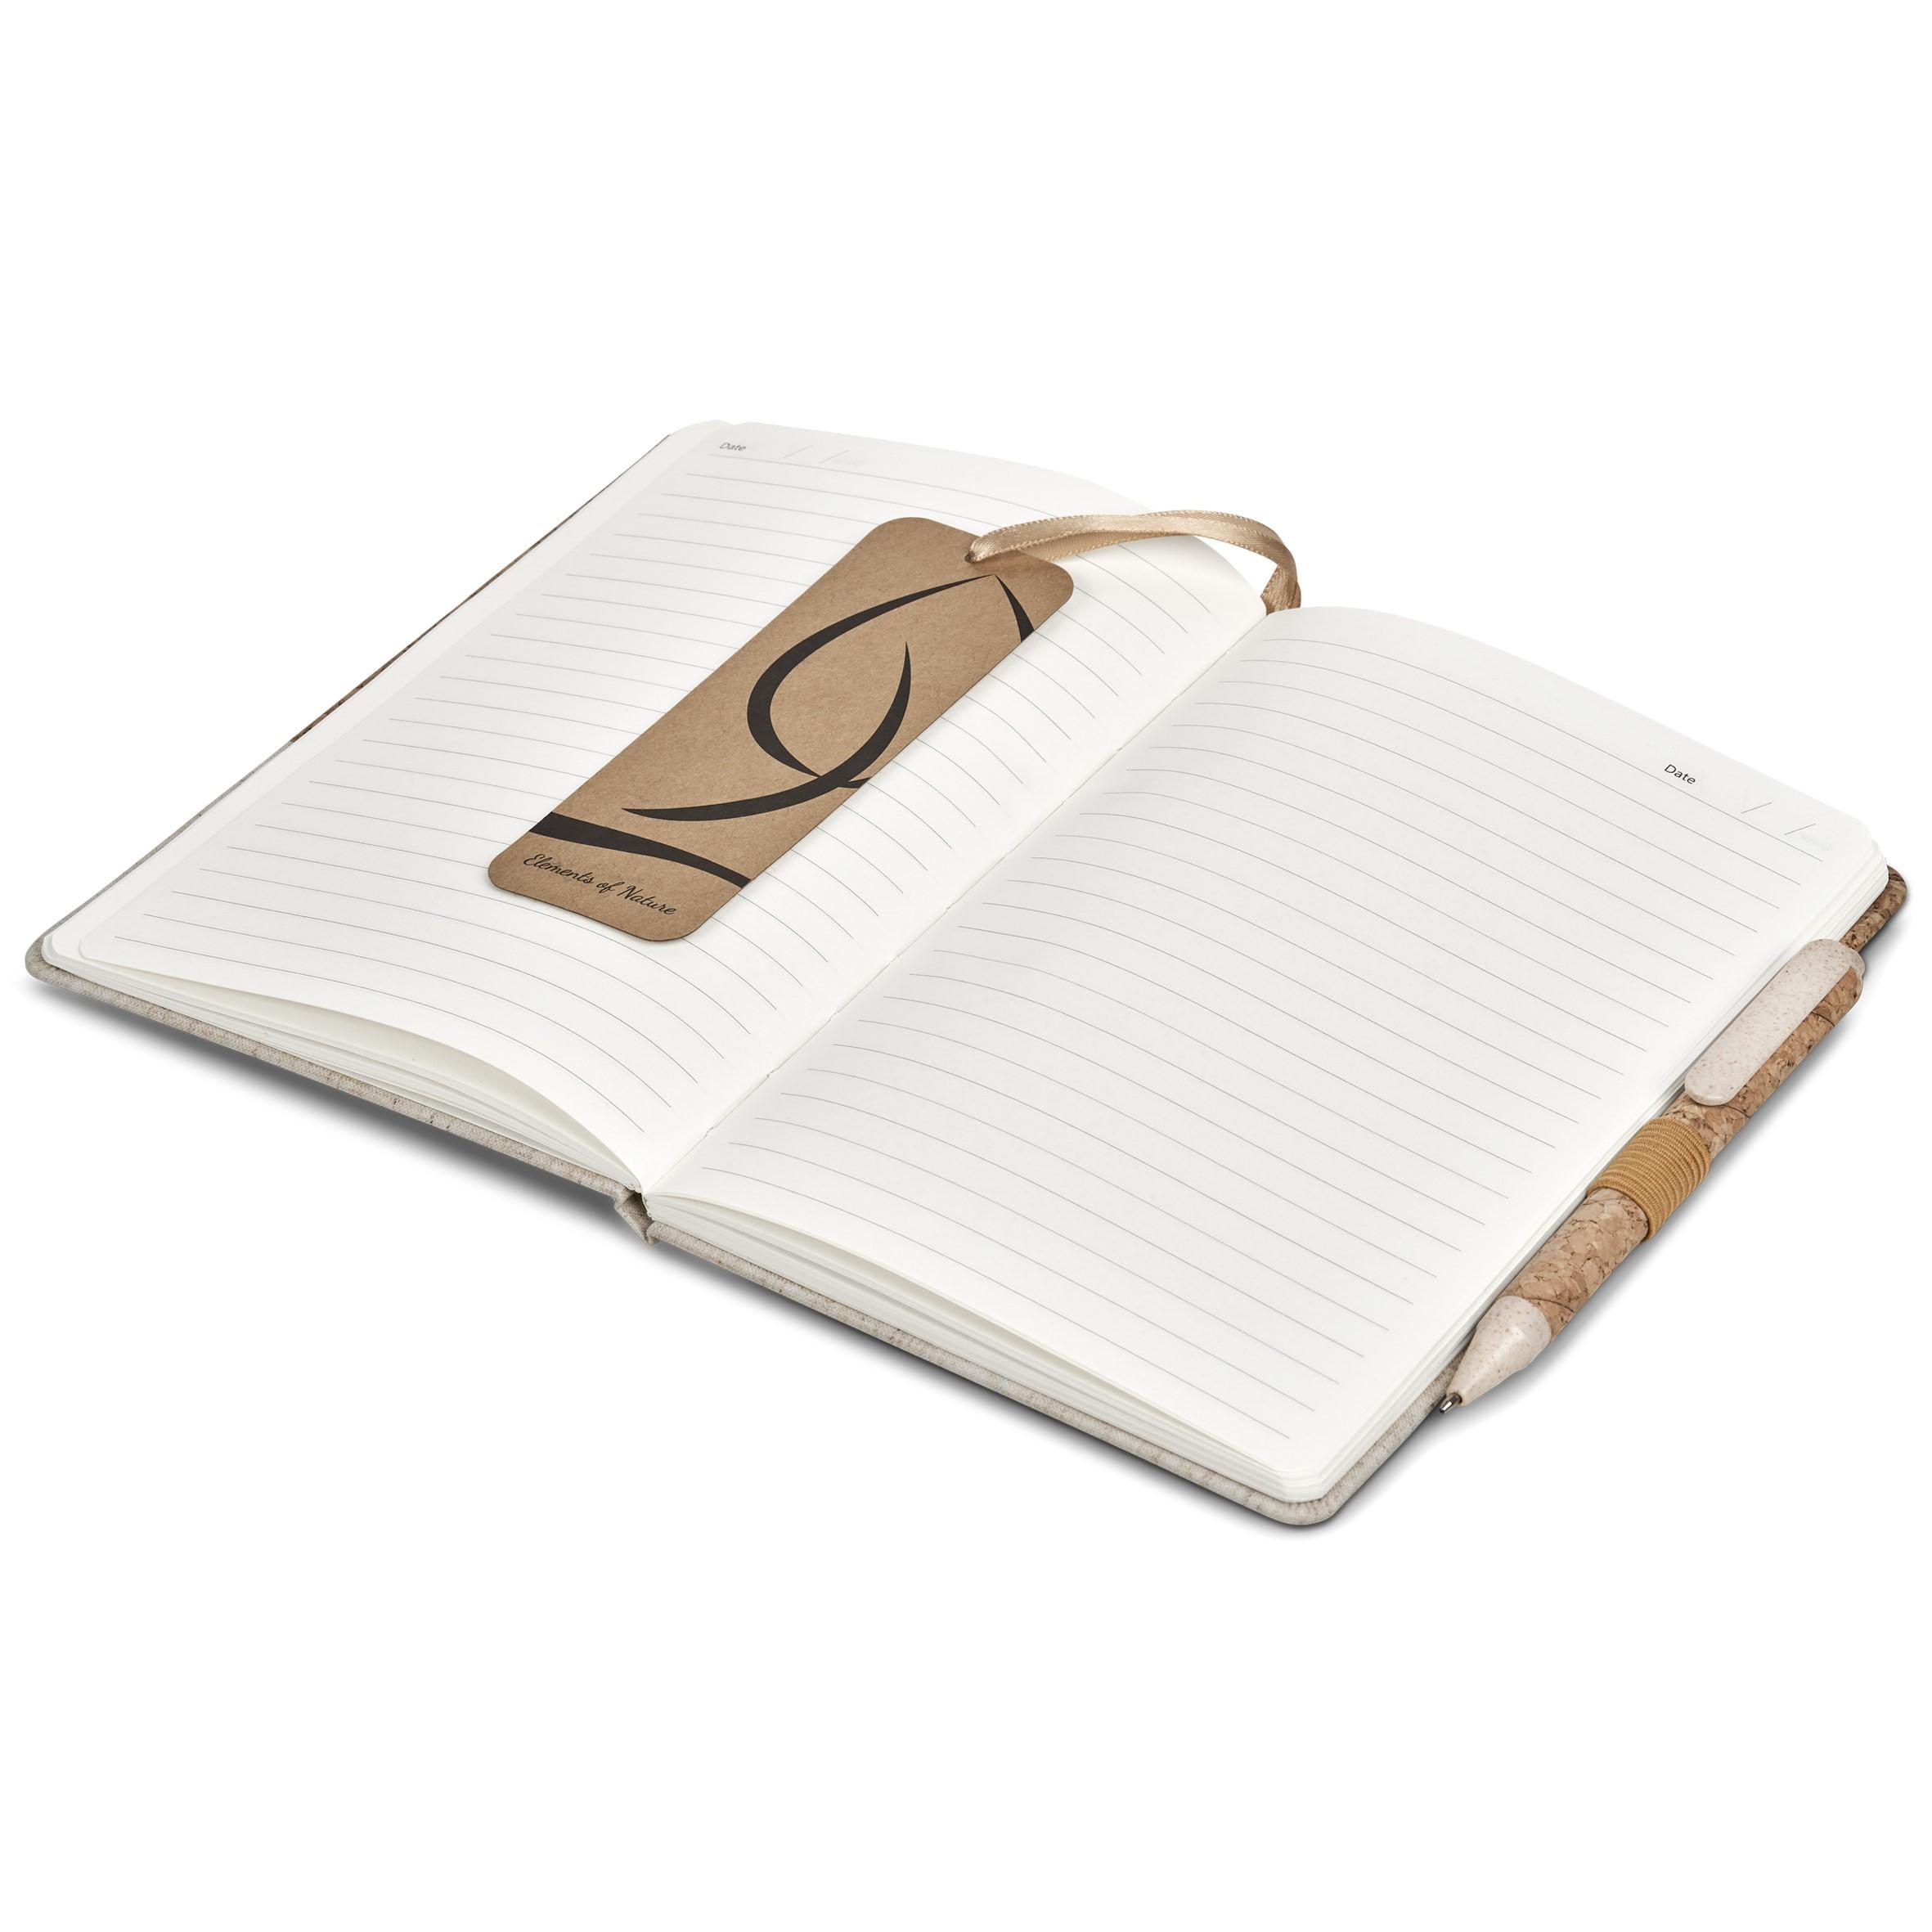 Giftsets   Okiyo Cardon Cork A5 Notebook Giftset - 2